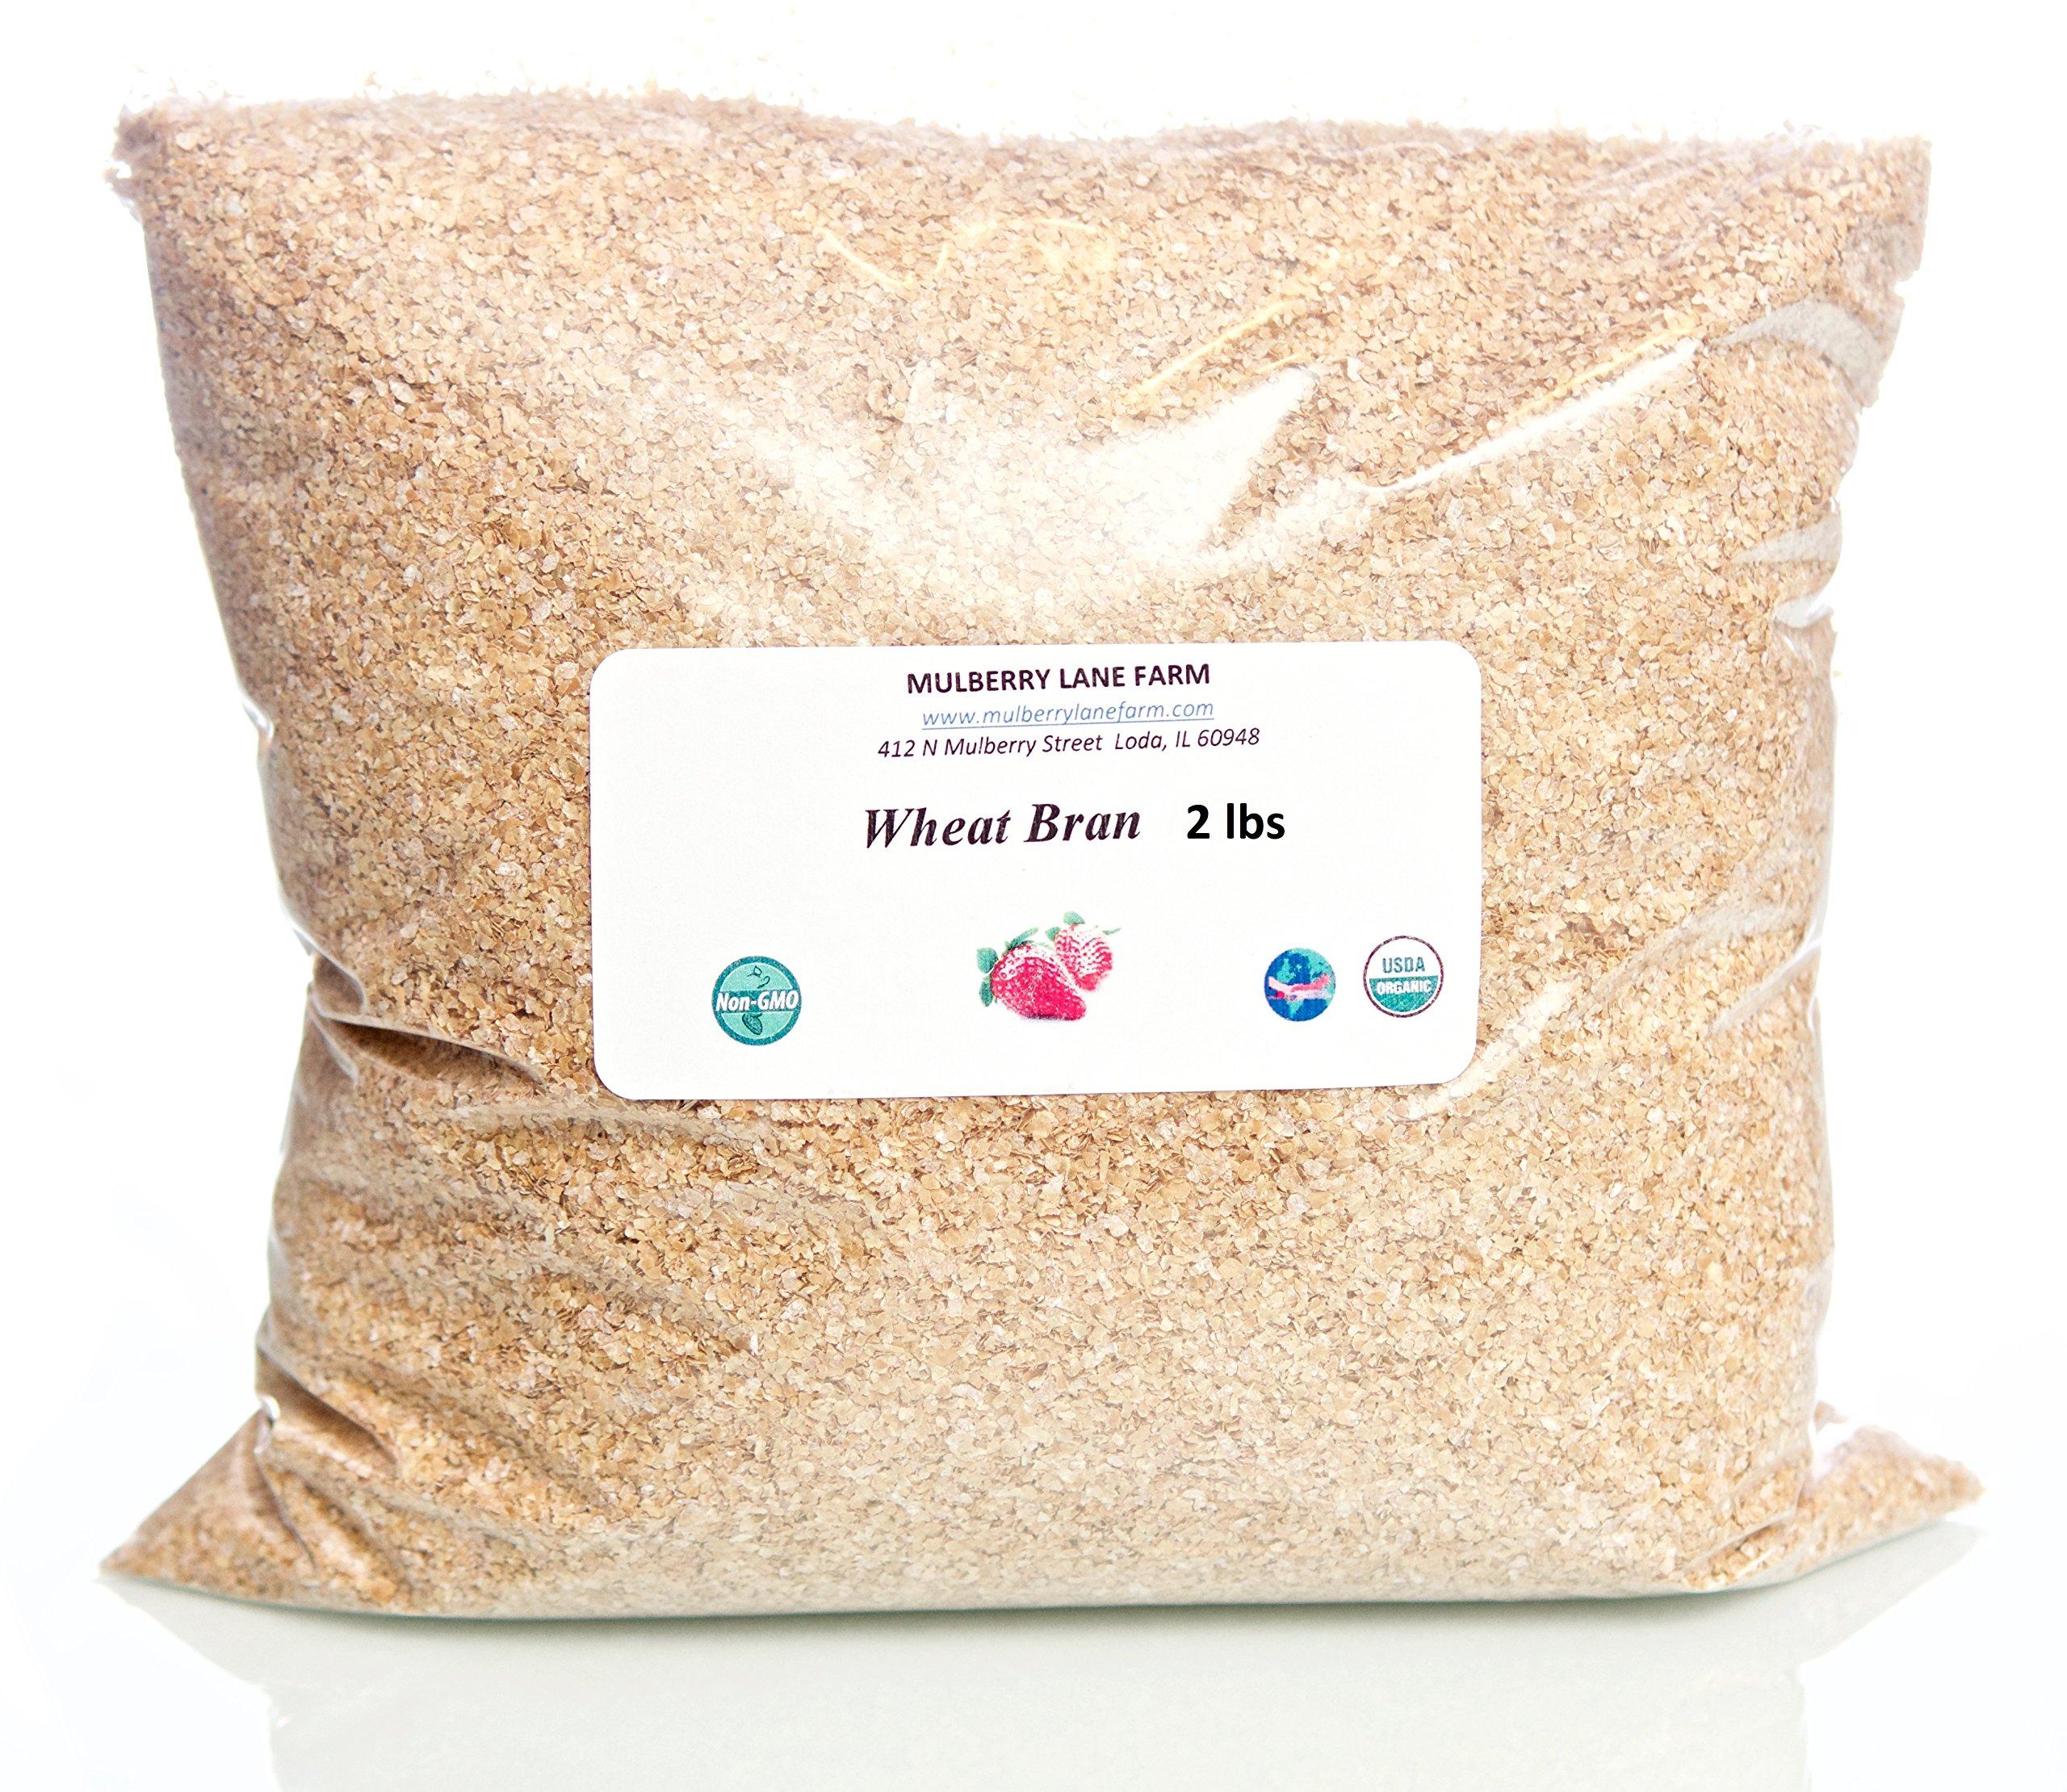 Wheat Bran, 32 Ounces, (2 lbs; Two Pounds), USDA Certified Organic, Non-GMO, BULK.